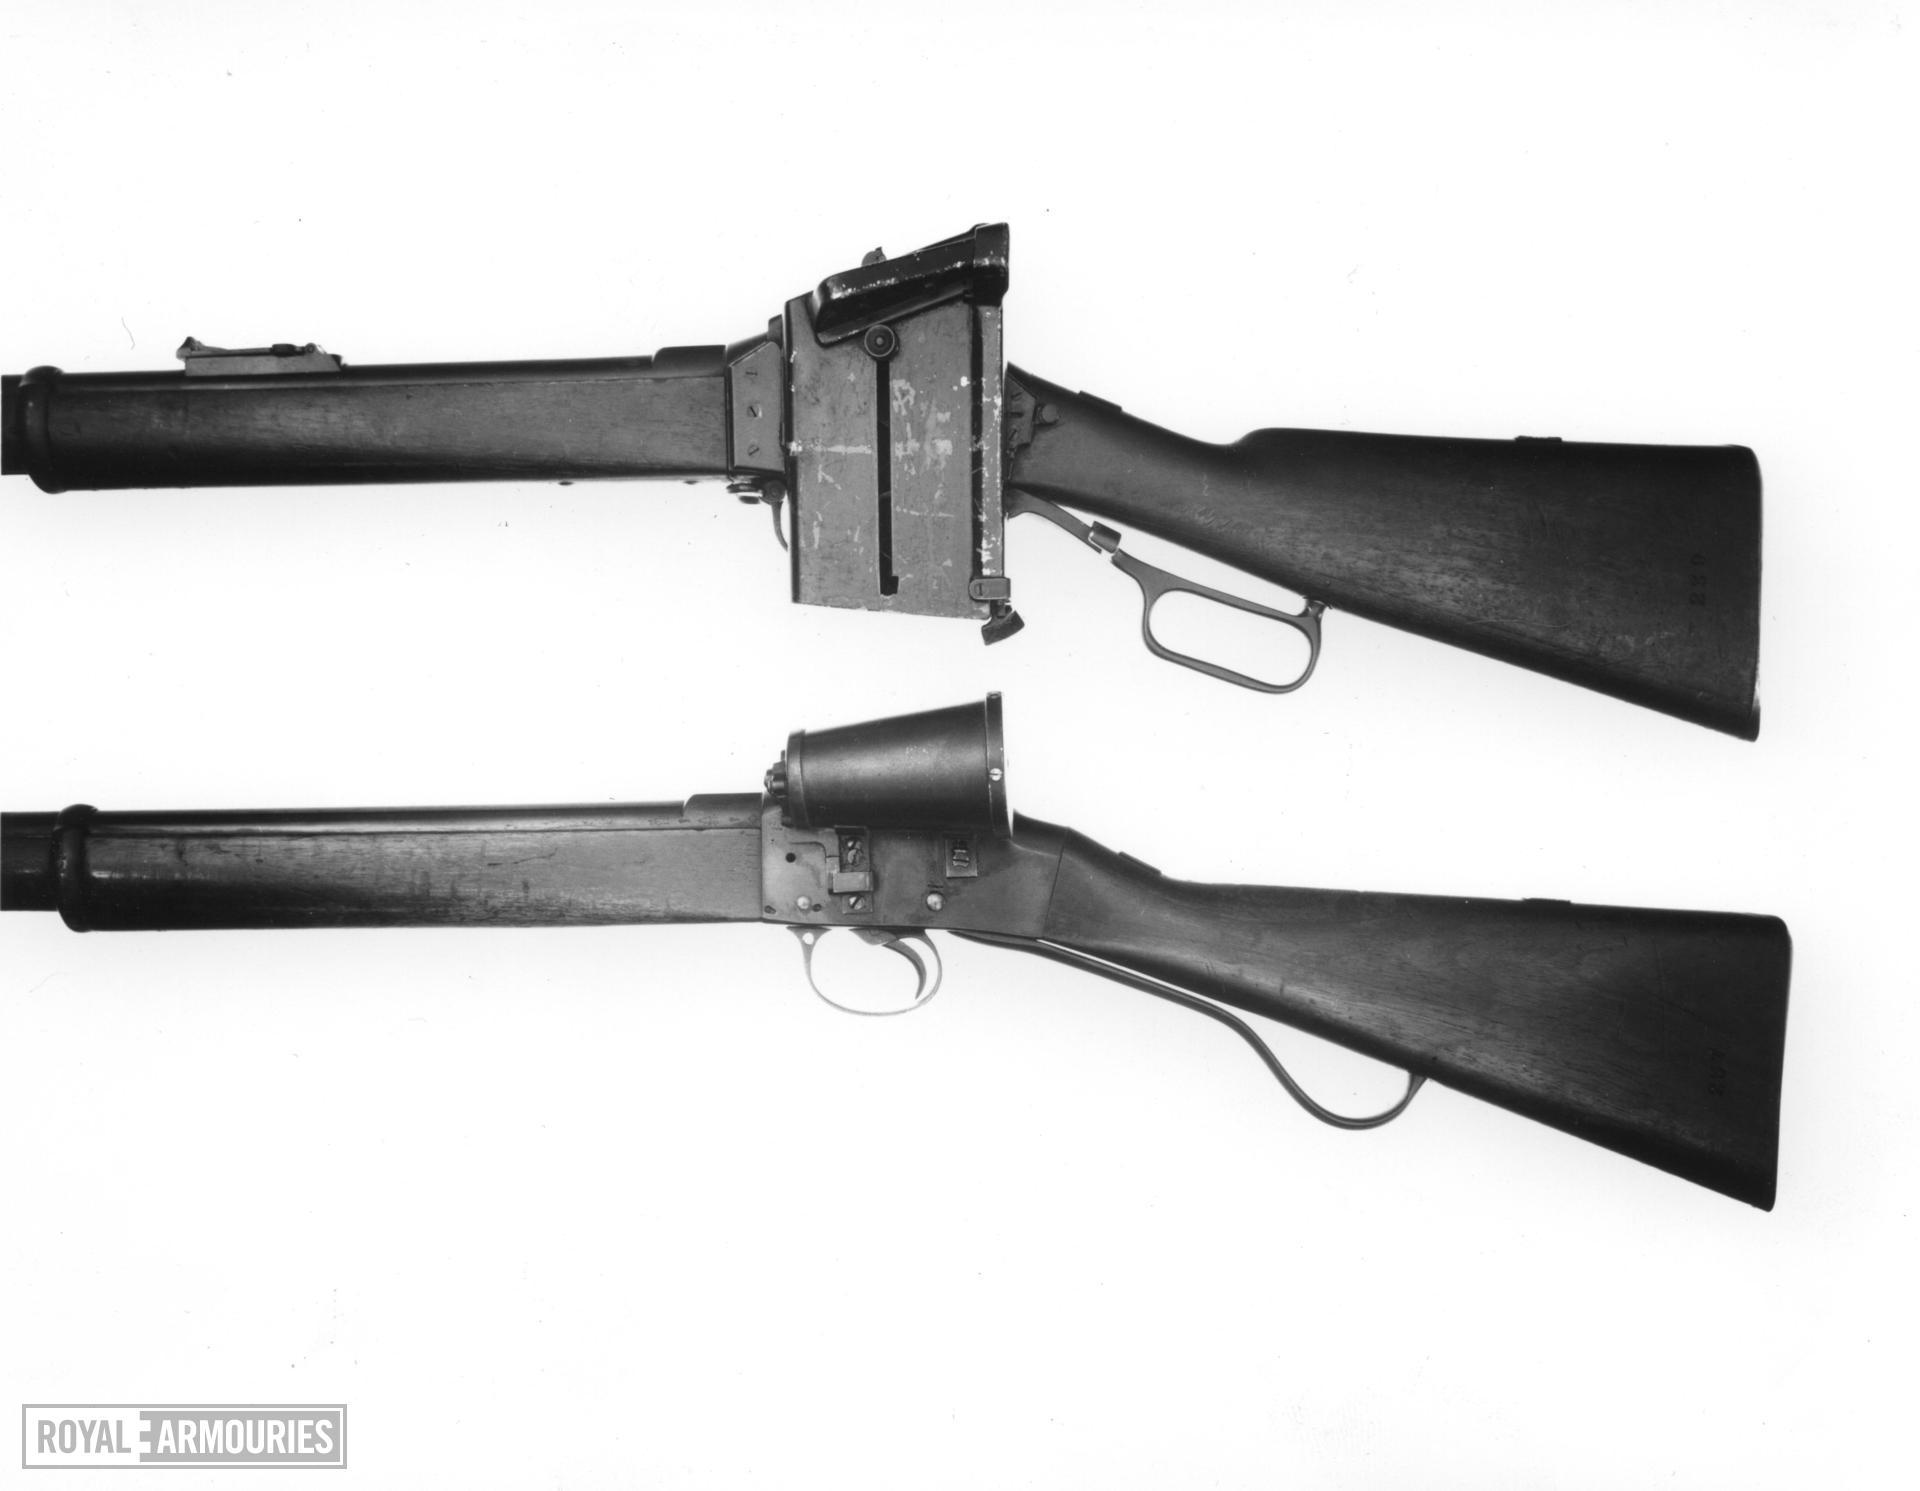 Centrefire breech-loading magazine military rifle - Enfield-Martini